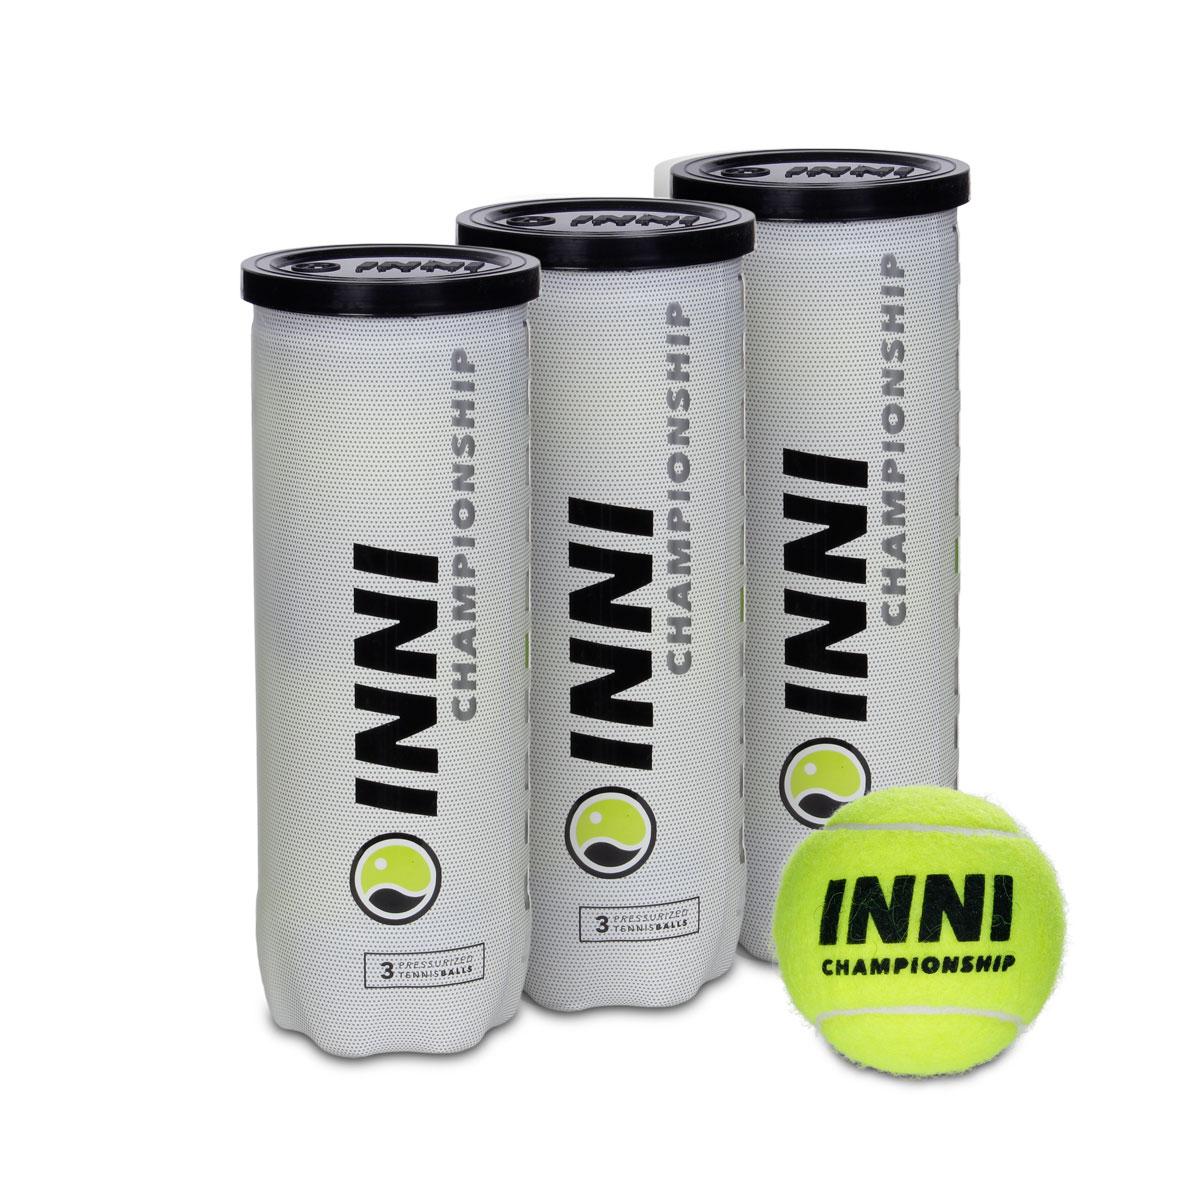 Bola de Tênis Inni Championship - Pack Com 03 Tubos